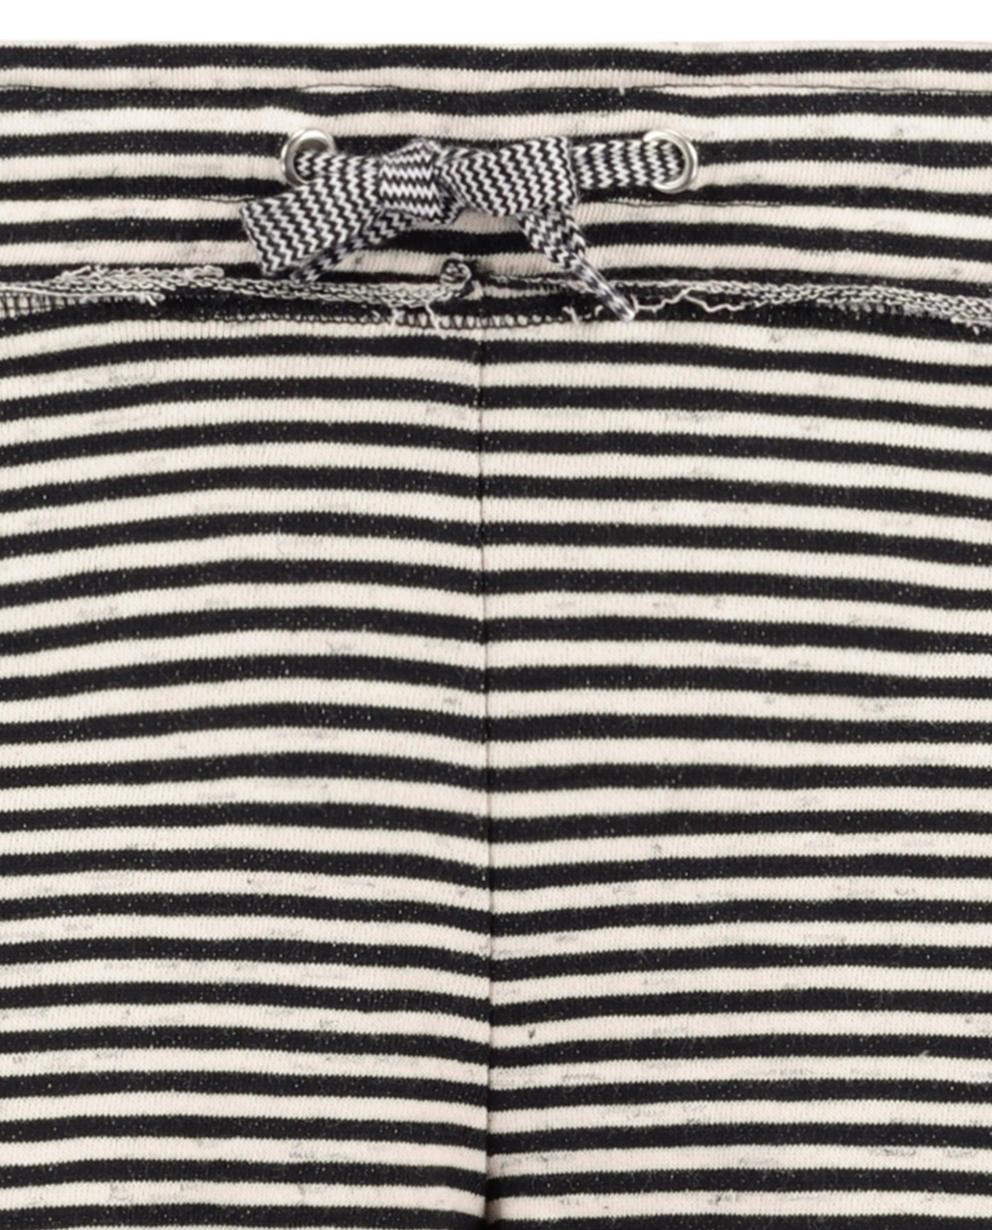 Shorts - black - Short molletonné rayé. Next. Plus en stock. Short  molletonné rayé. noir et blanc c91ffbf671a